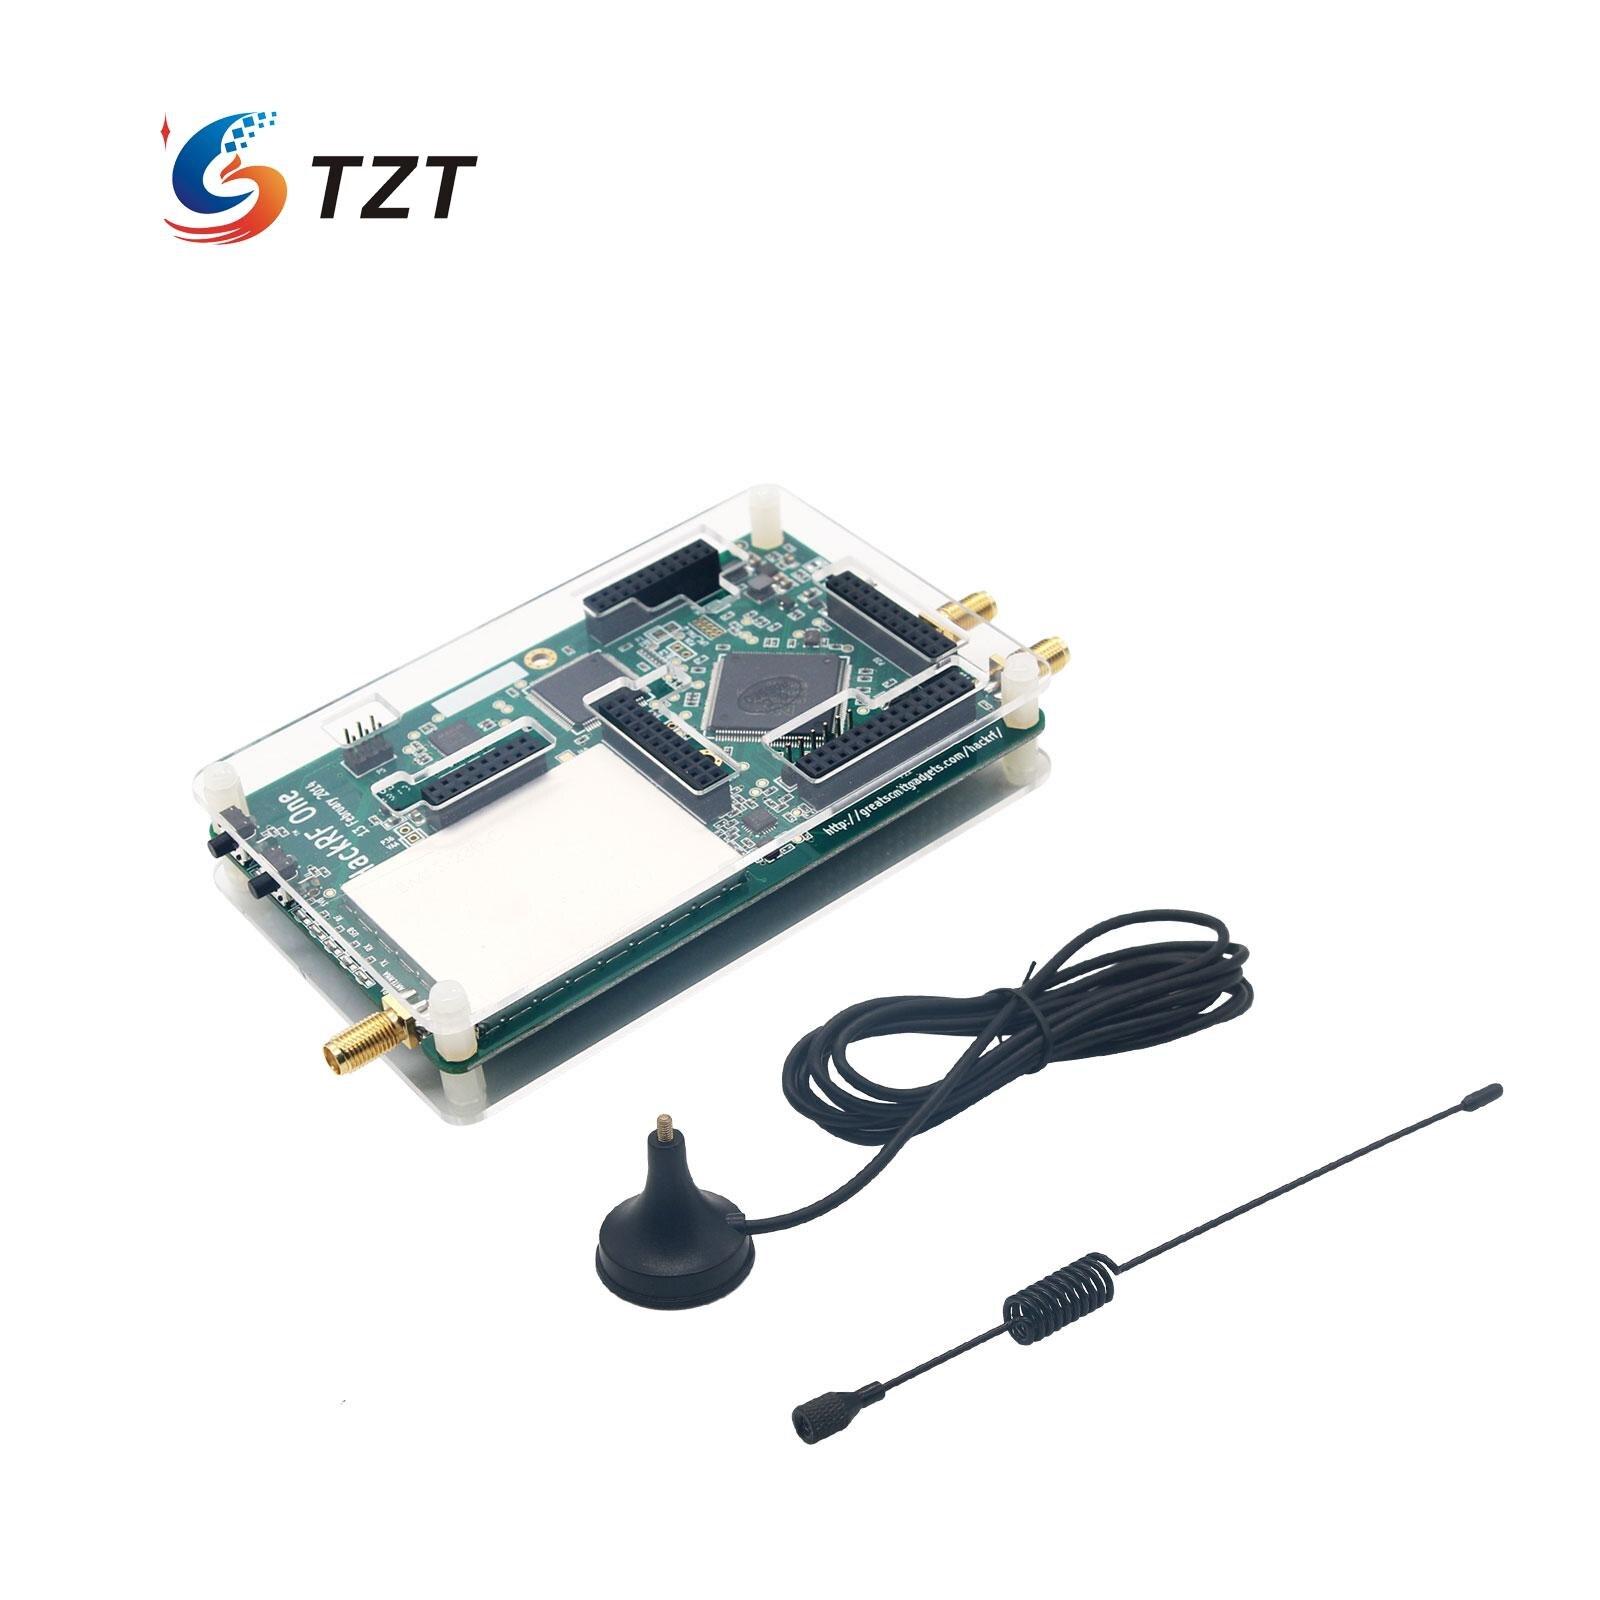 HackRF One 1 MHz to 6 GHz SDR Platform Software Defined Radio Development Board sheffilton подставка для цветов колонна медный антик